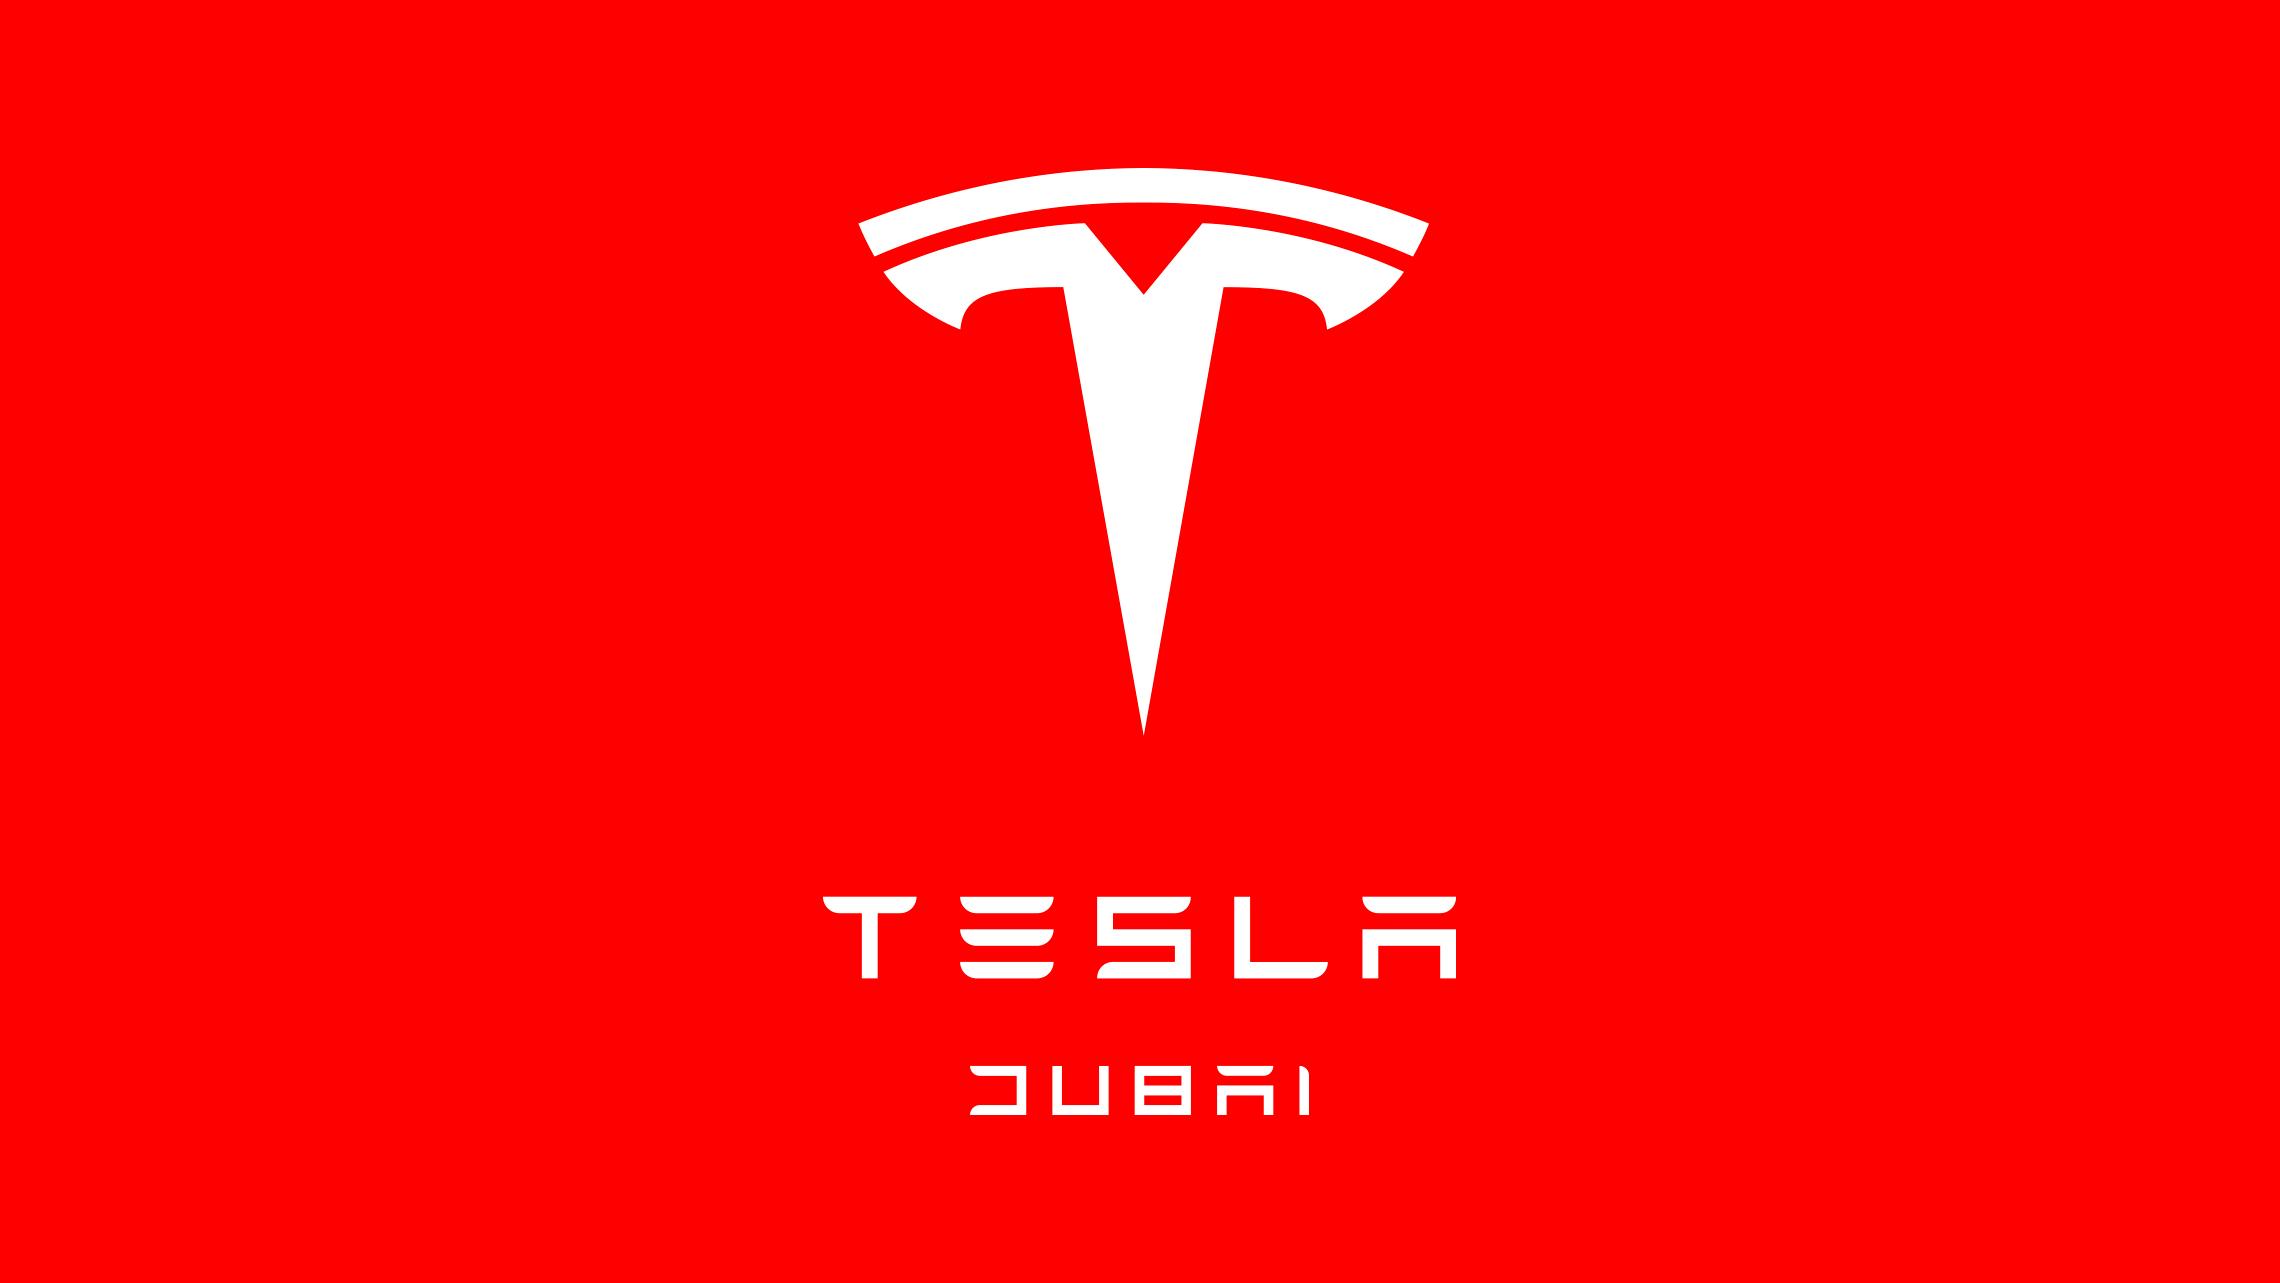 Tesla-Font-5.png